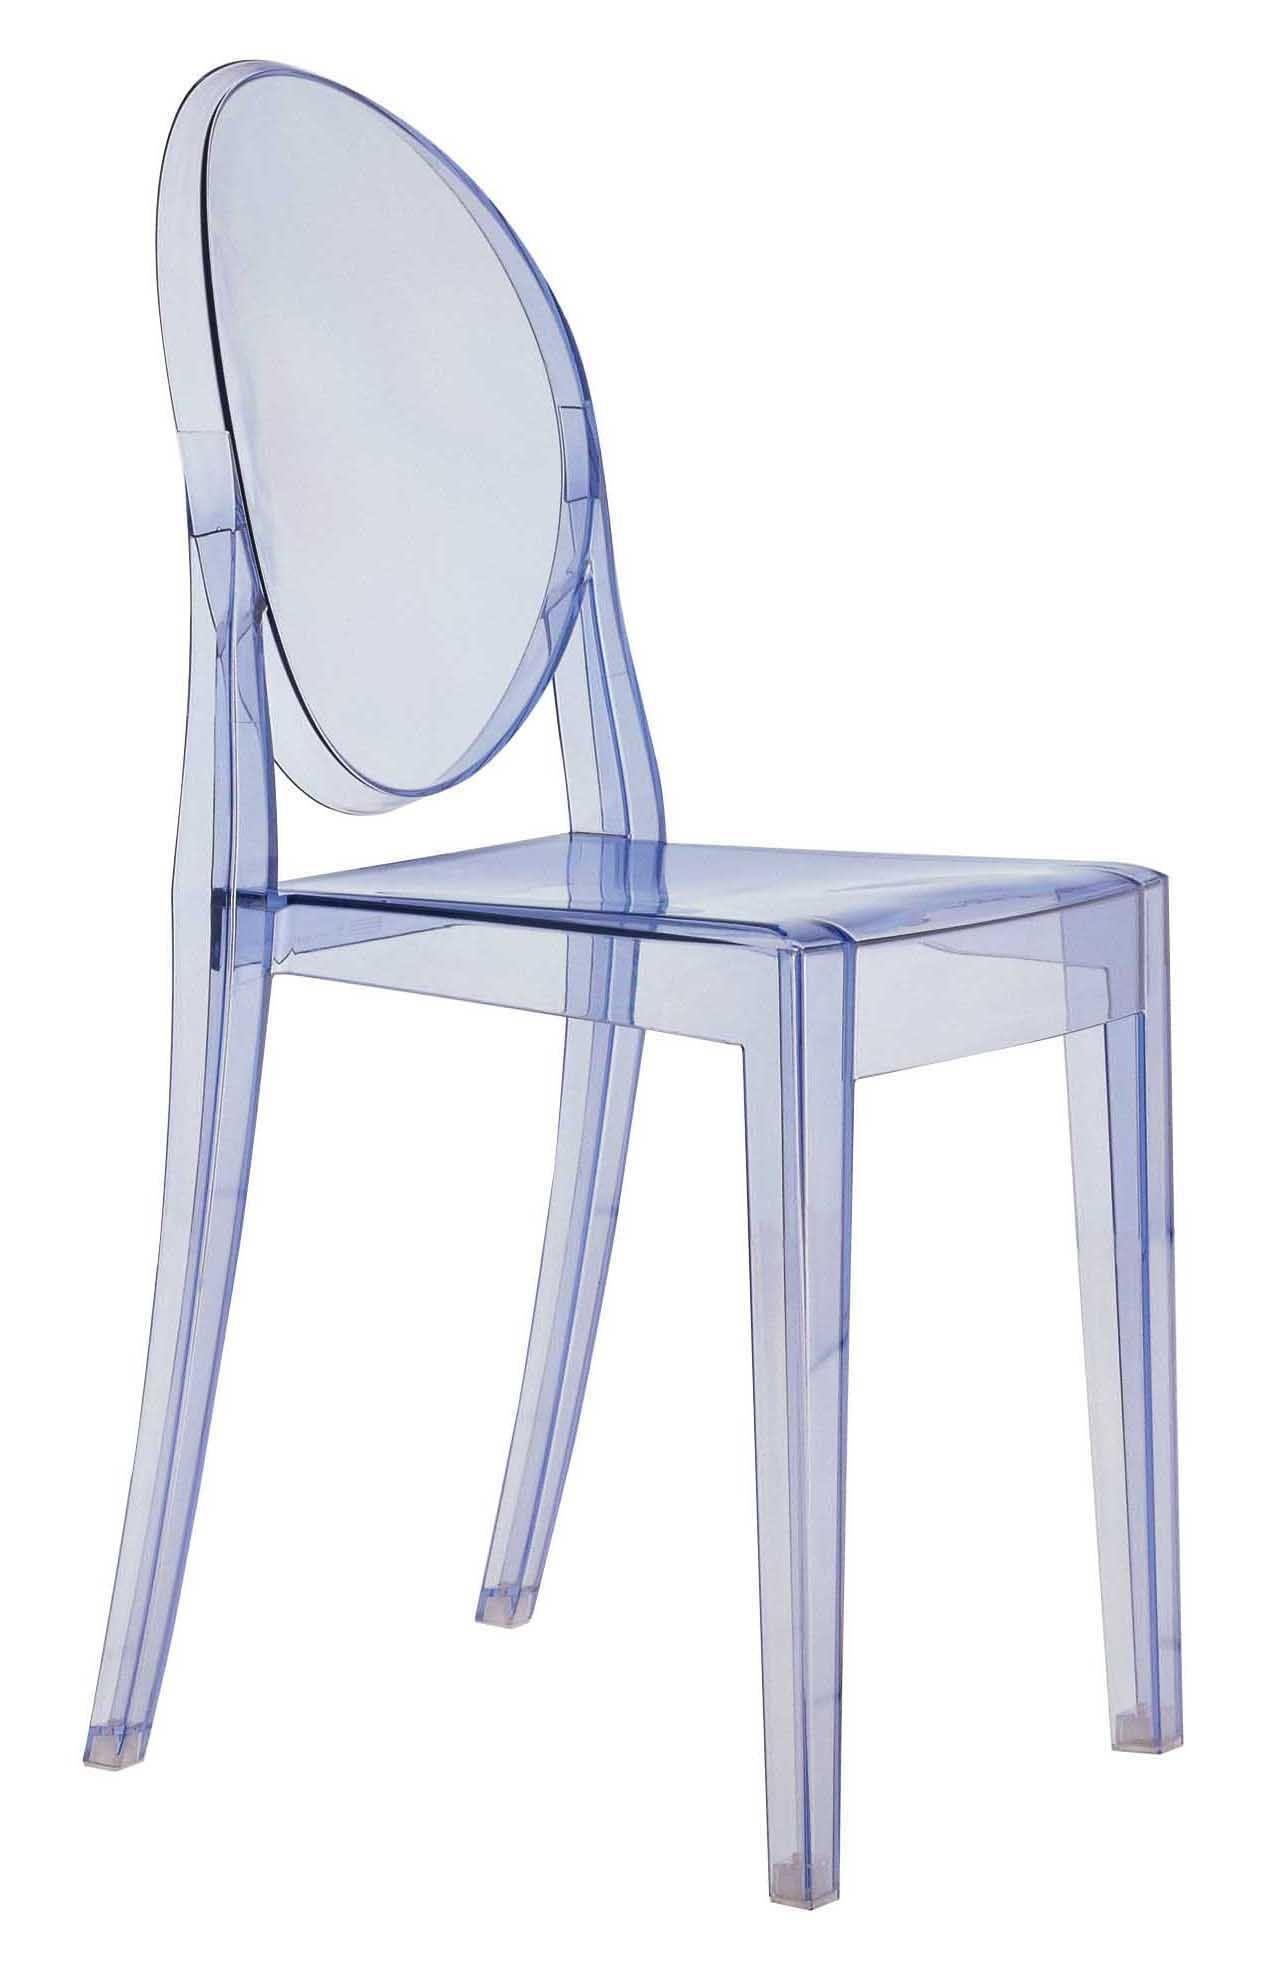 chaise empilable victoria ghost polycarbonate bleu ciel kartell. Black Bedroom Furniture Sets. Home Design Ideas